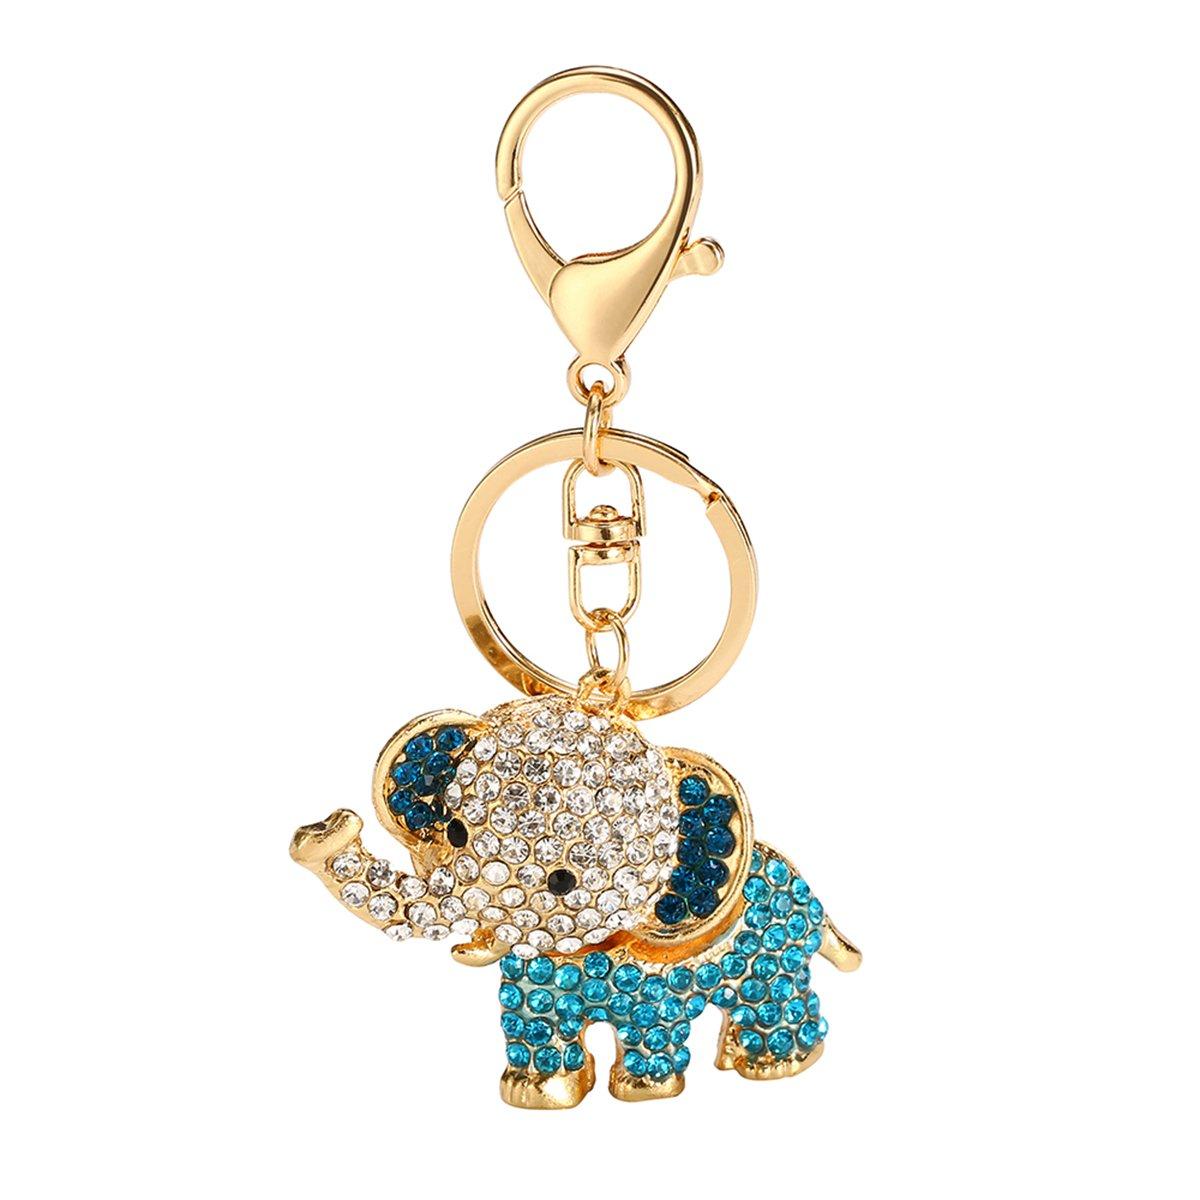 c7790860116 Mayitr Crystal Lucky Rhinestone Charms Pendant Key Chains Cute Purse Bag  Gifts New (Elephant Blue)